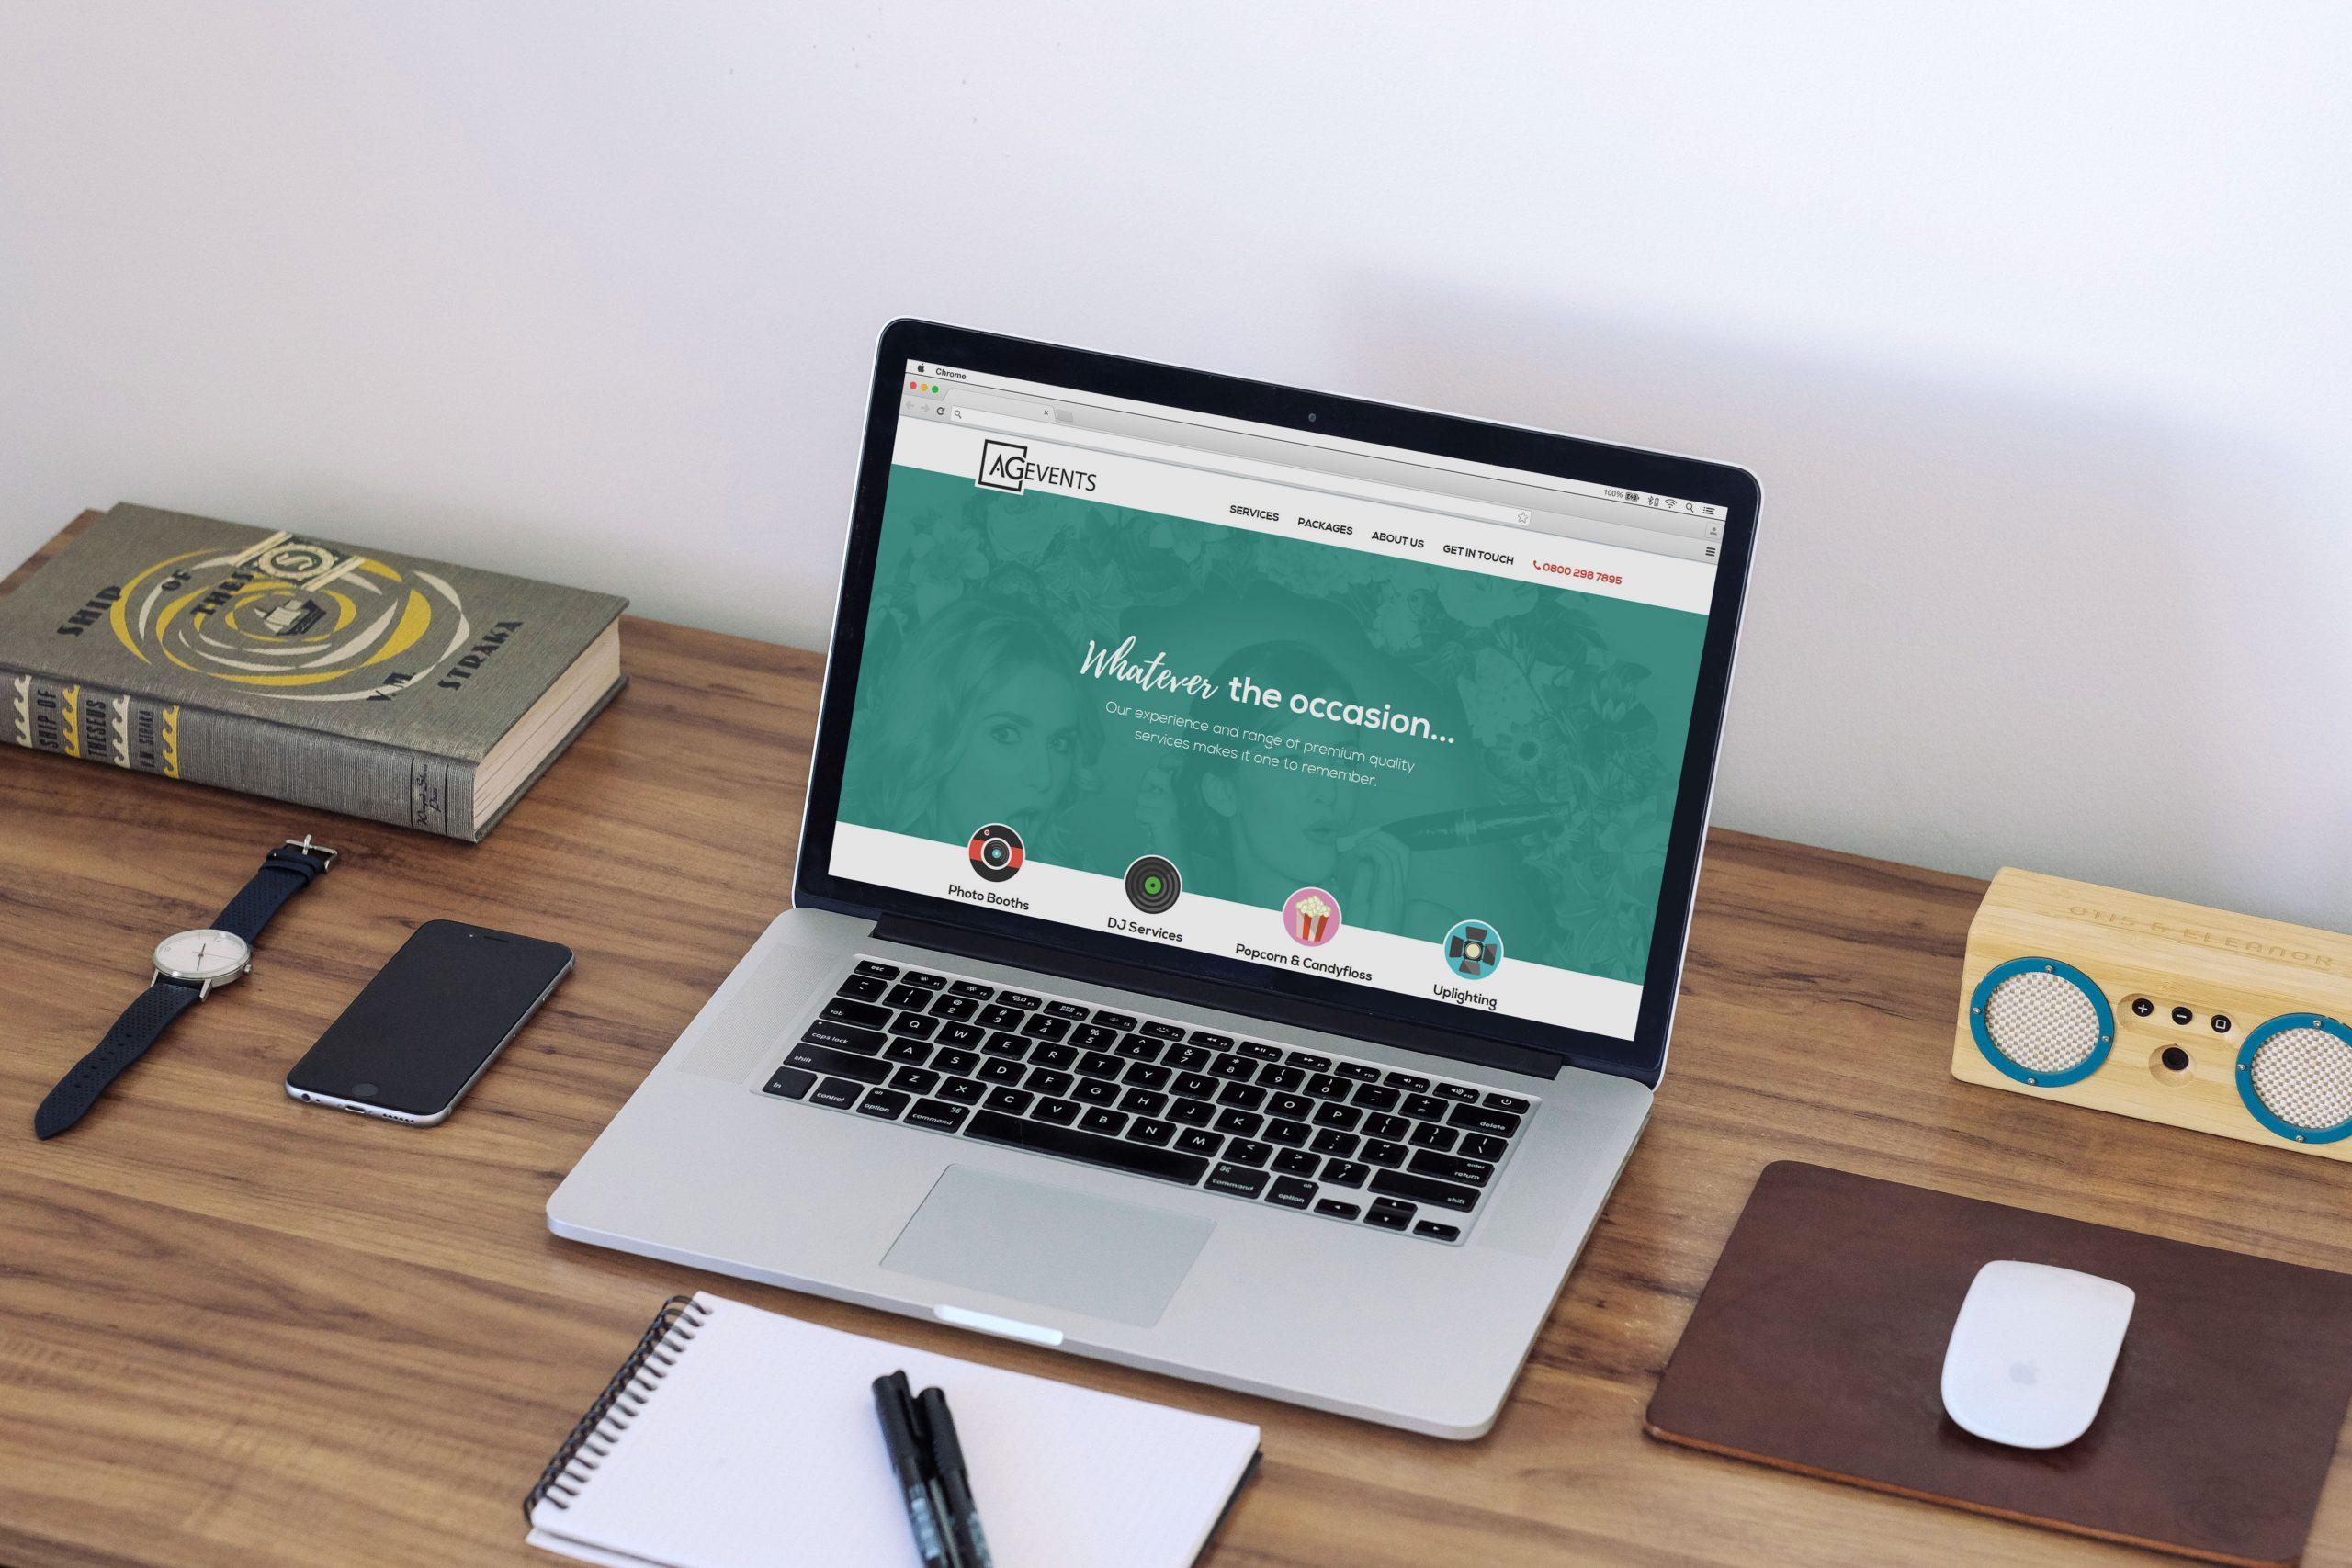 AG Events website displayed on laptop